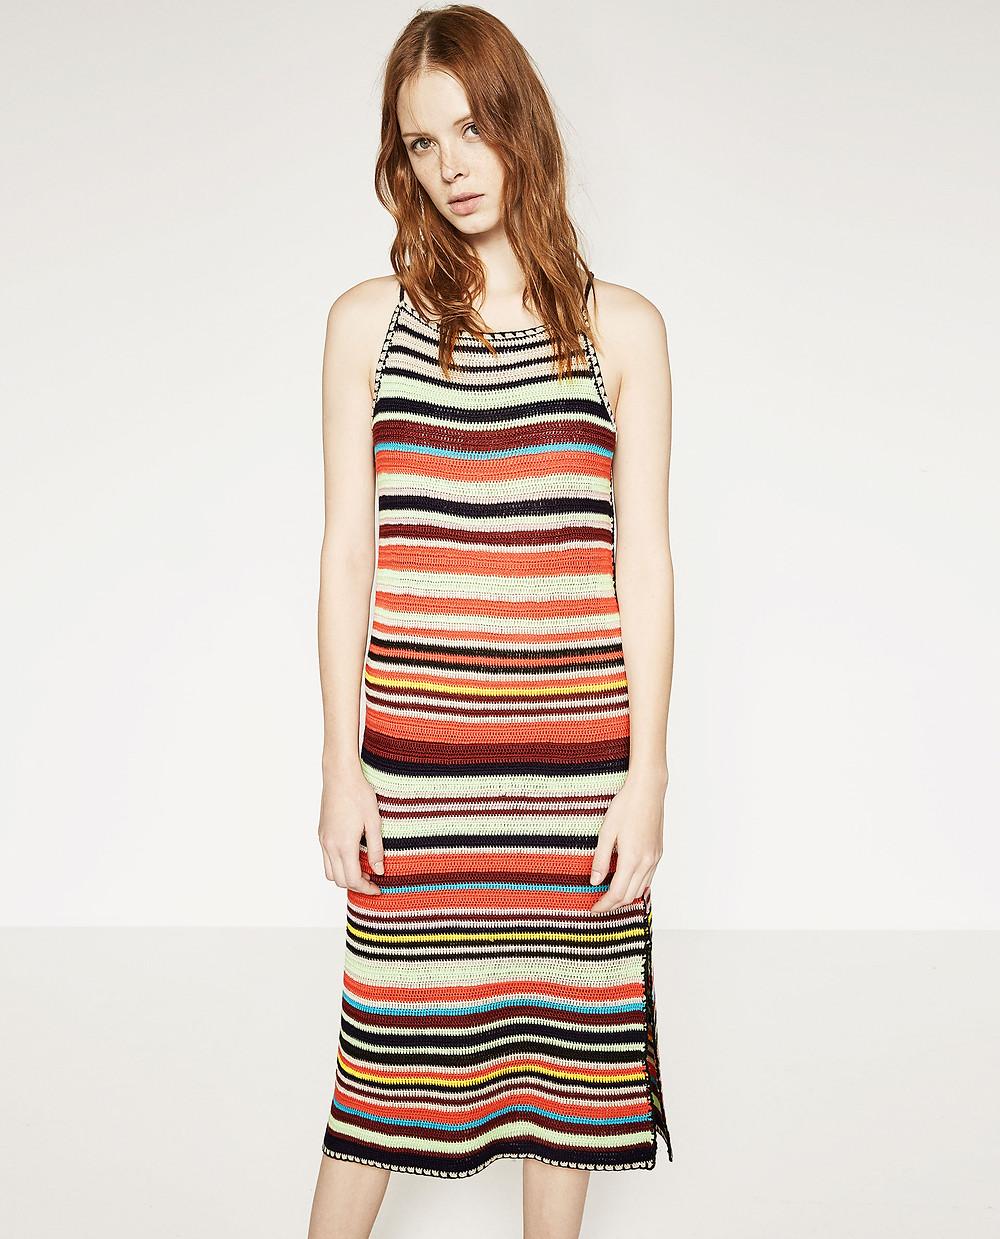 Zara multicolored crochet dress $59.90